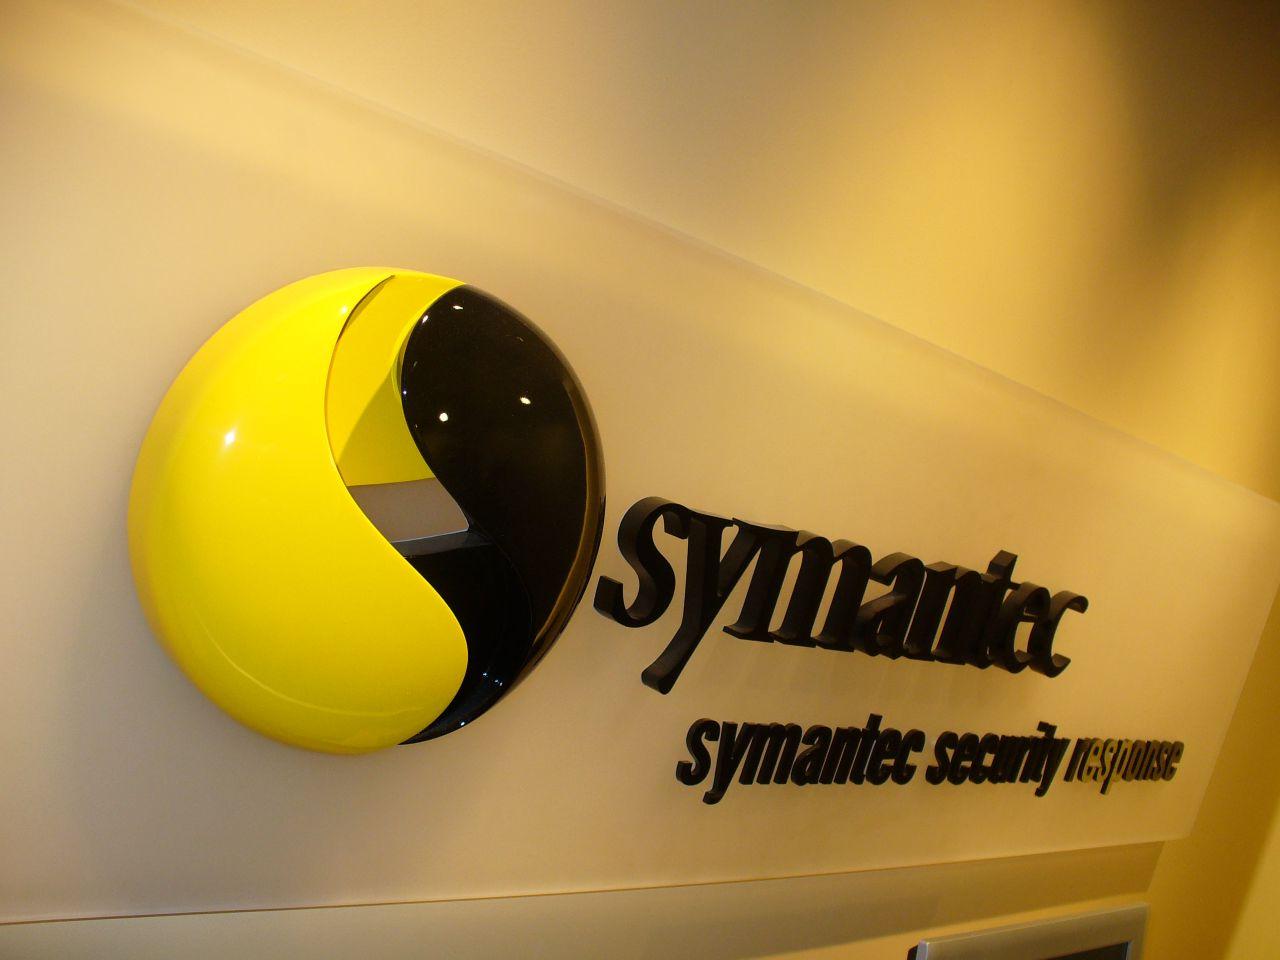 Symantec to buy Blue Coat for $ 4 65 billion